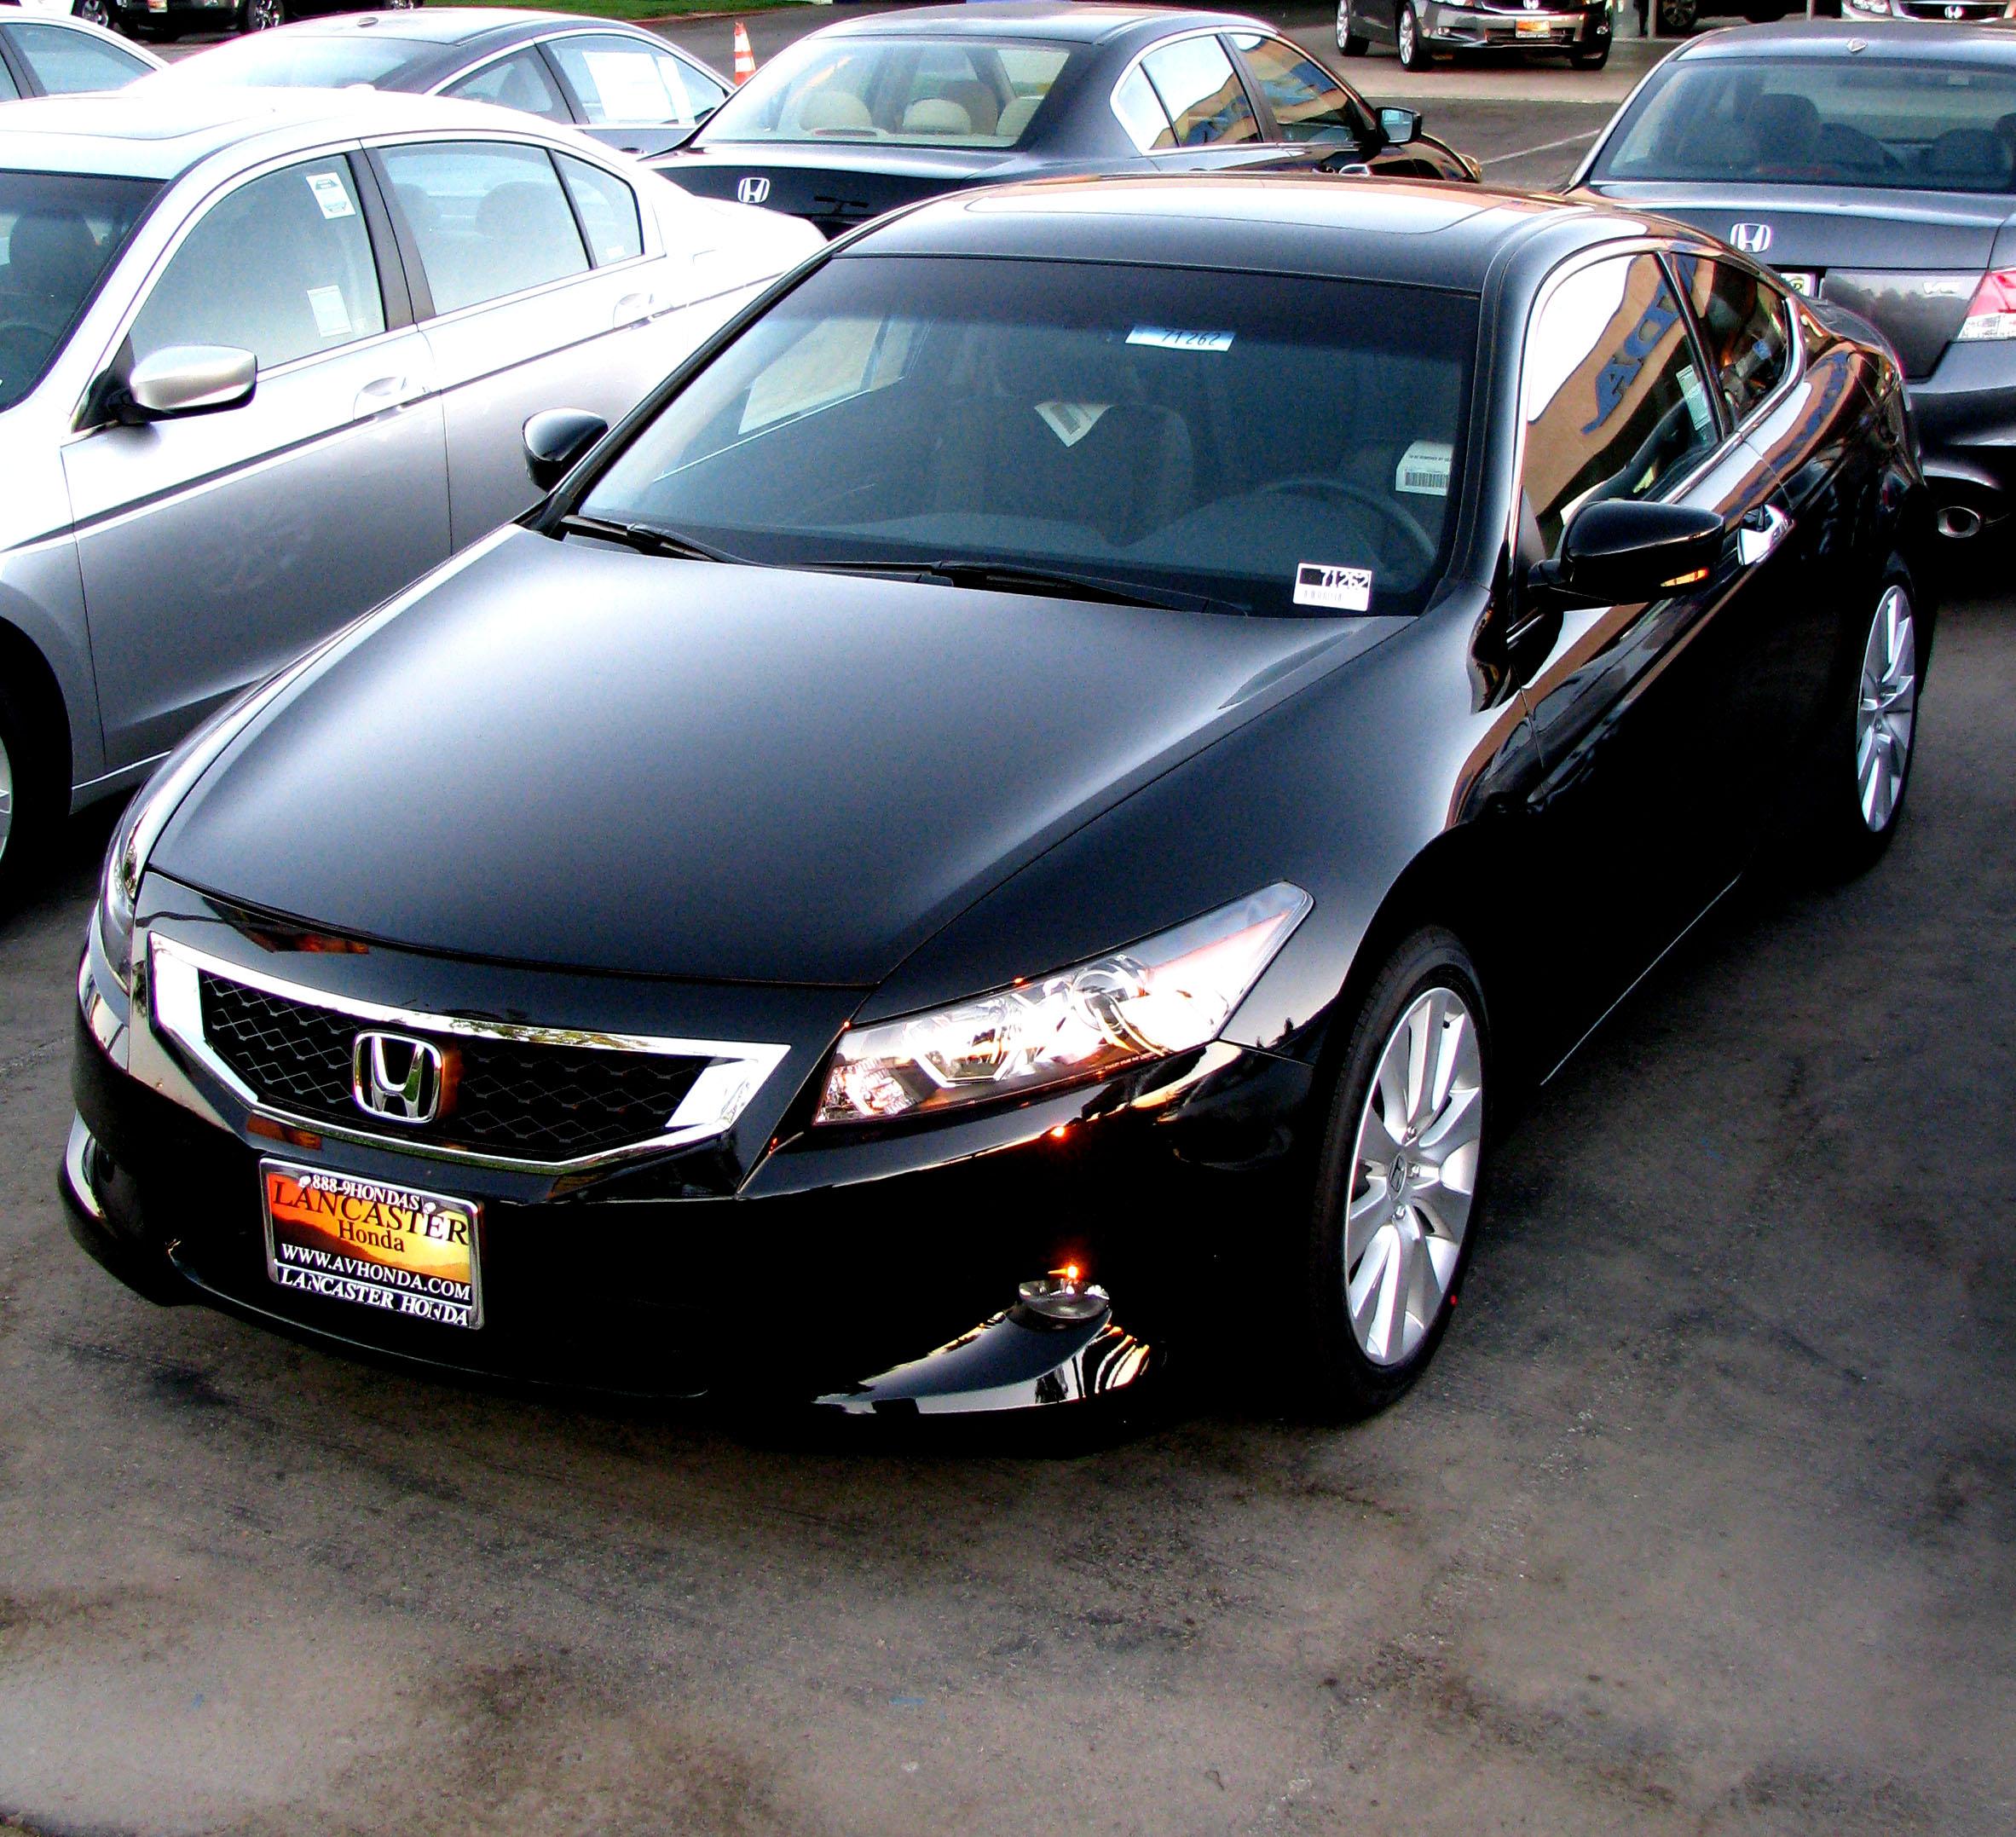 Best Car Insurance Coverate